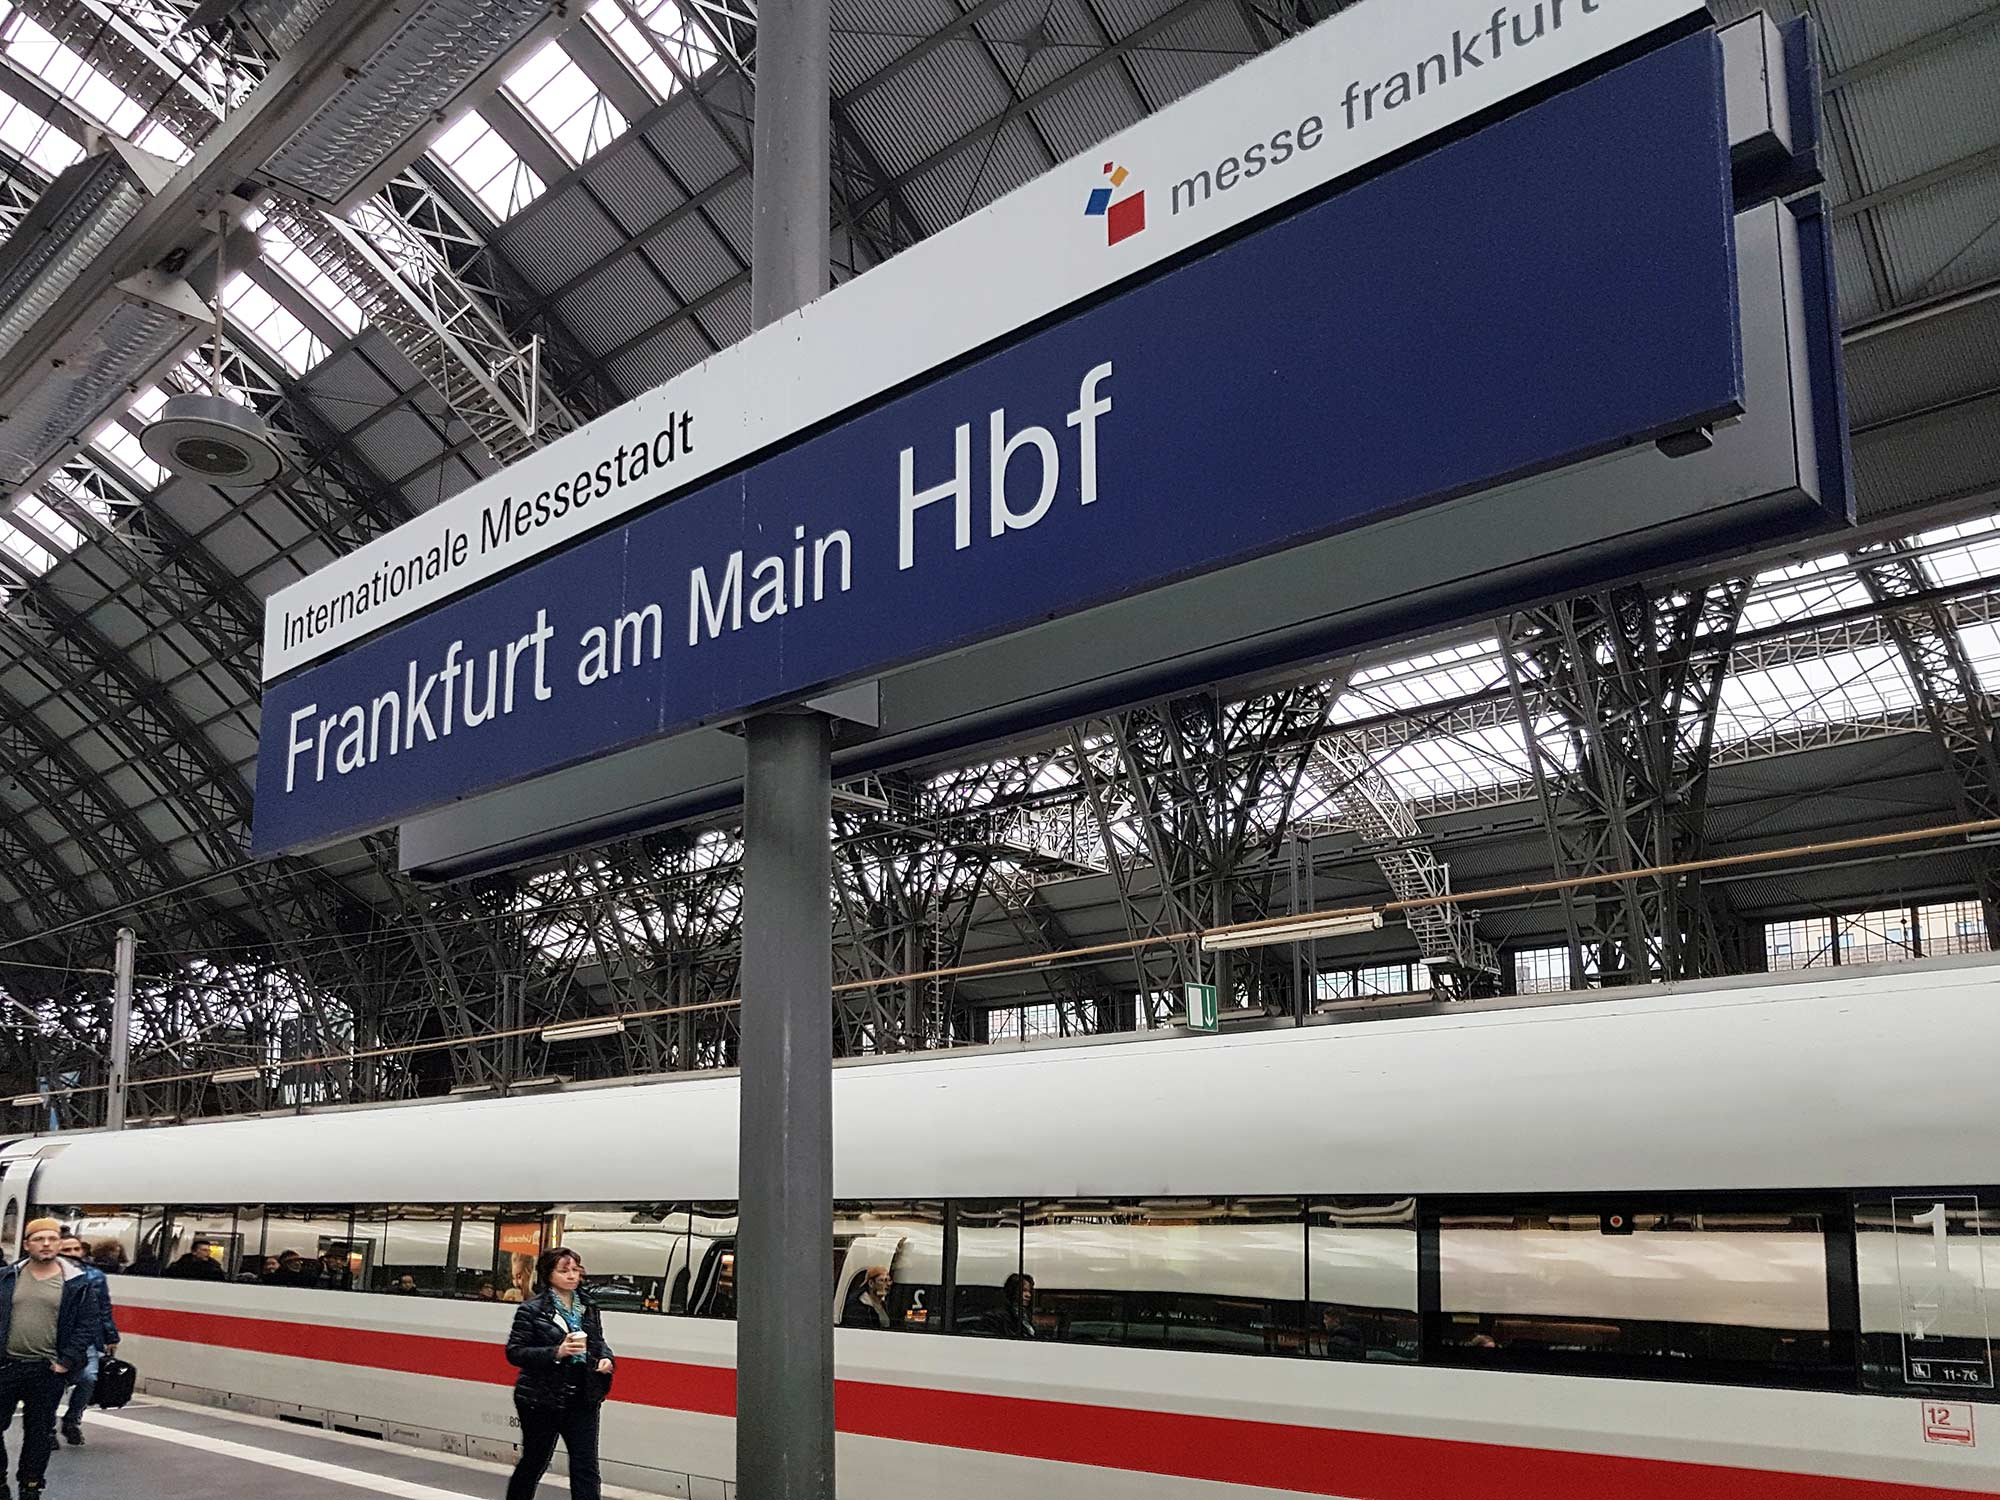 Internationale Messestadt Frankfurt - Hauptbahnhof Frankfurt am Main